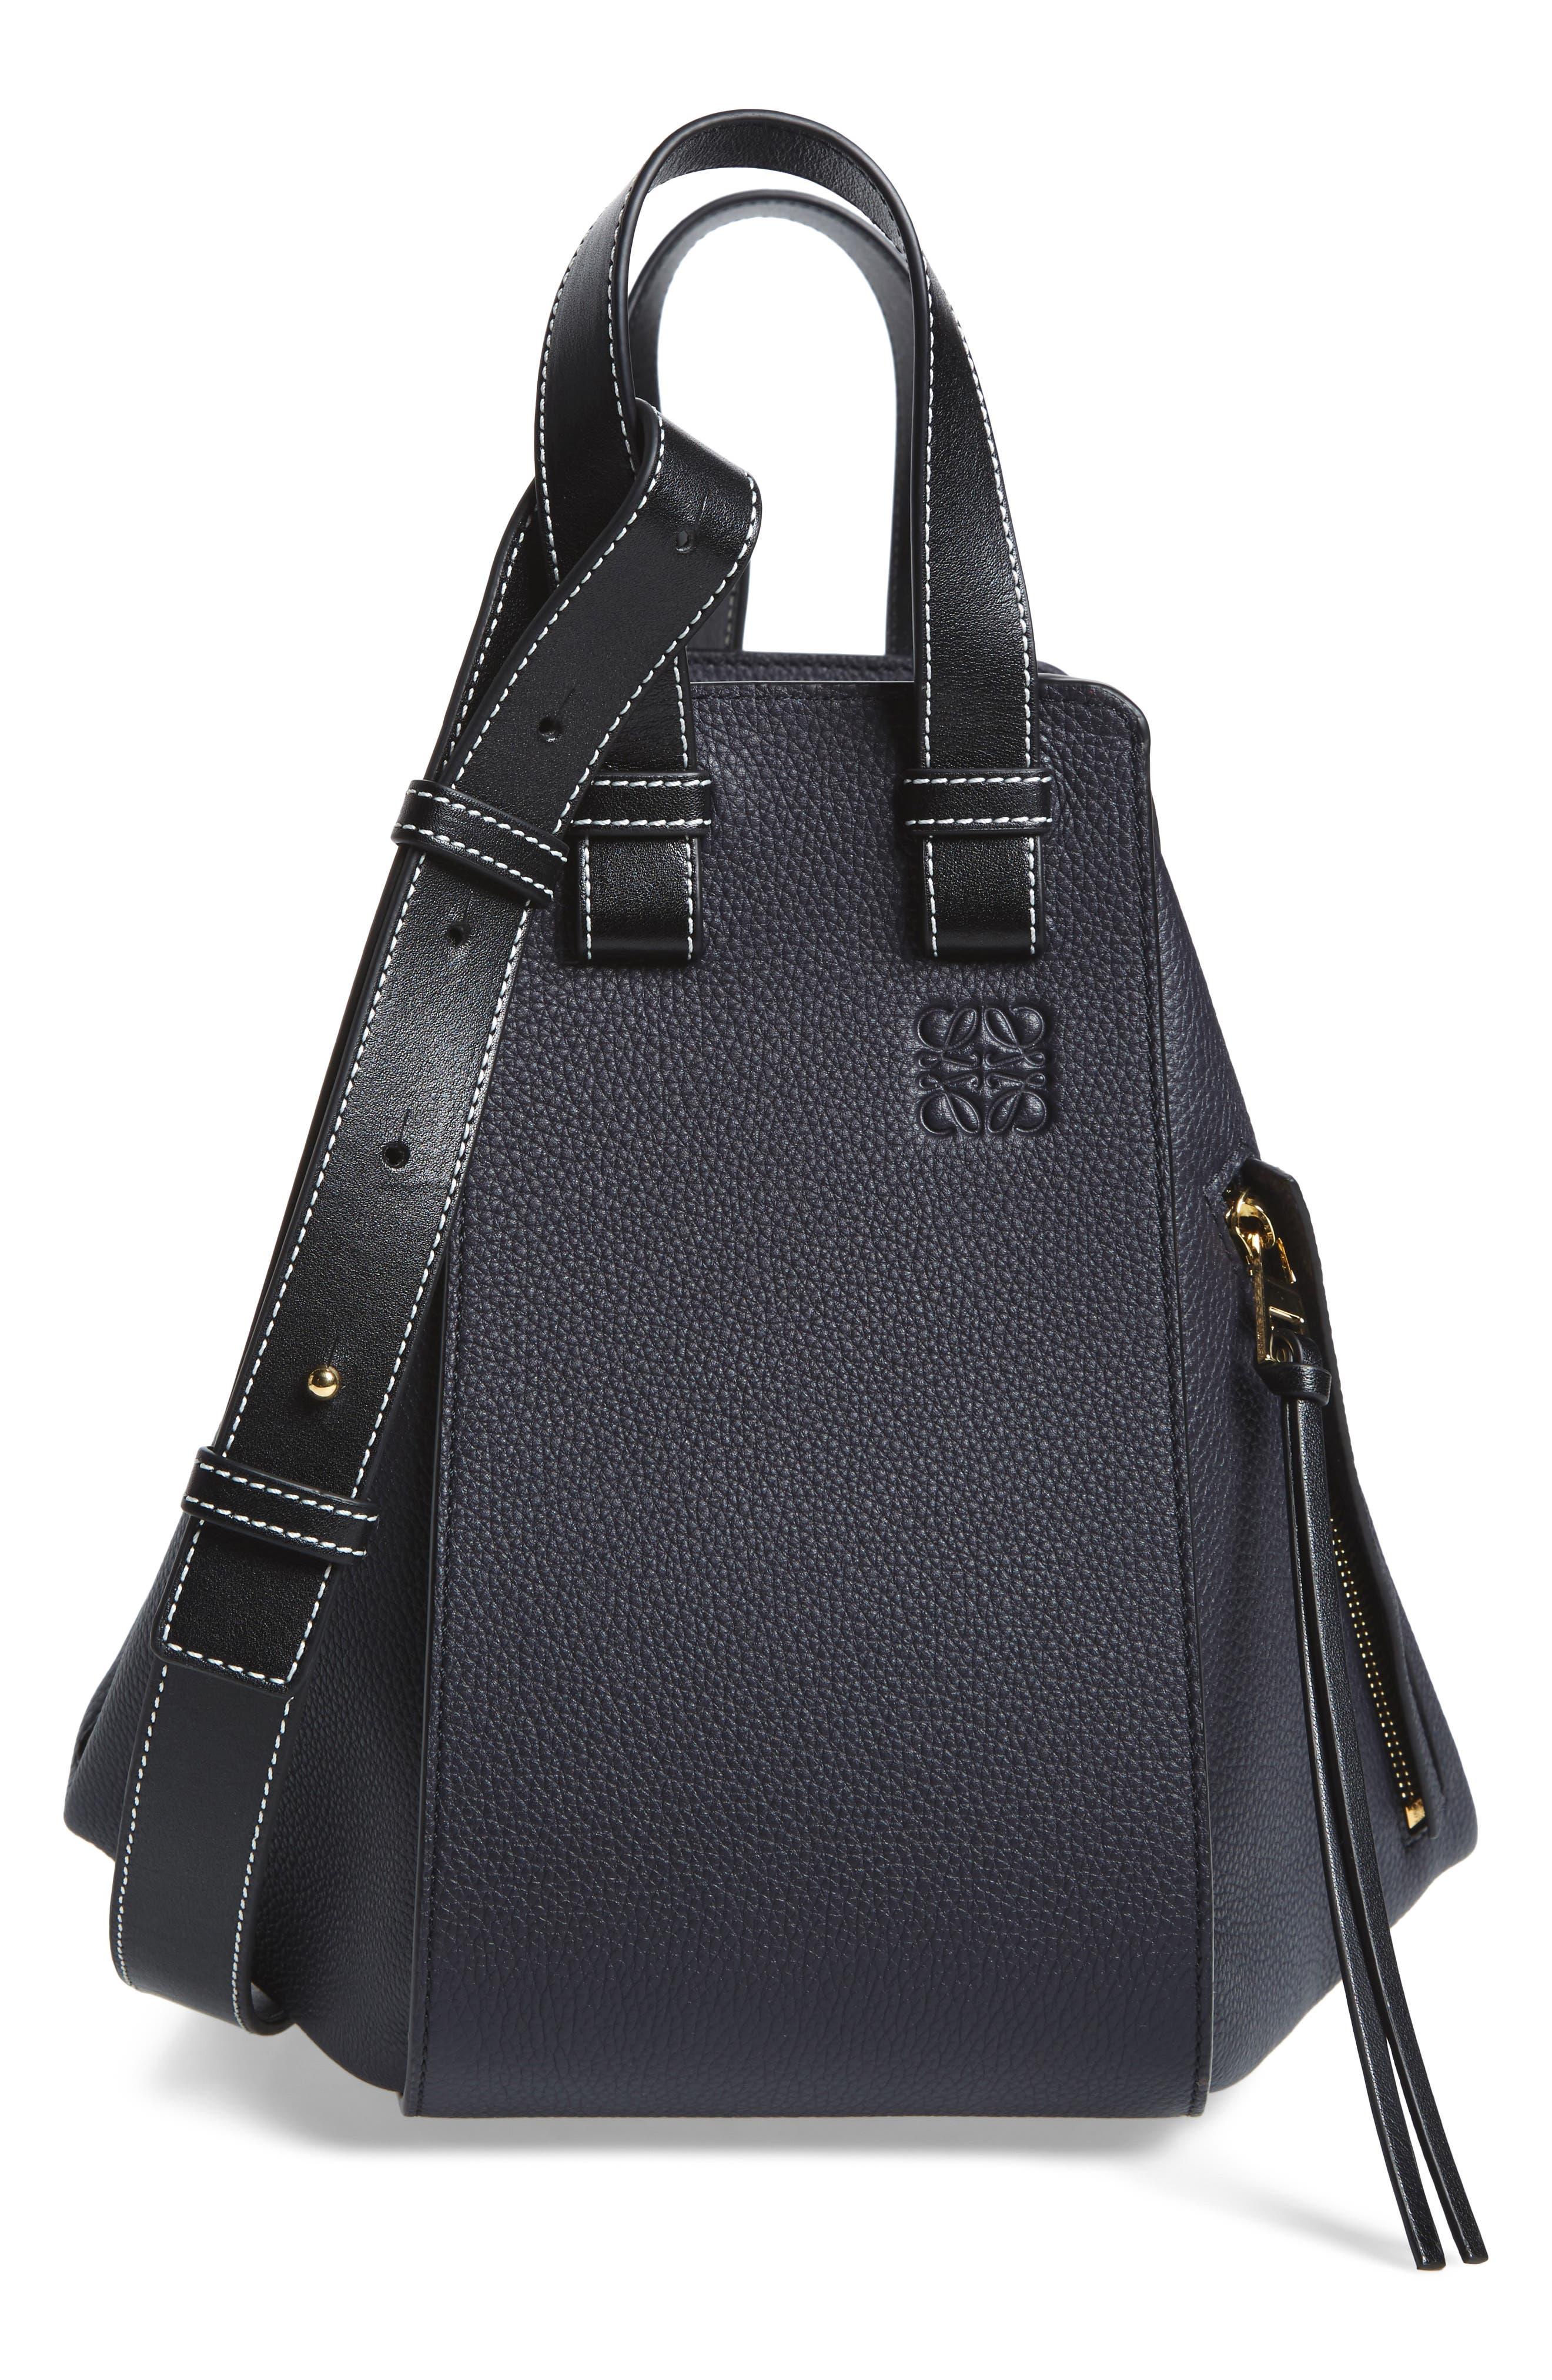 Alternate Image 1 Selected - Loewe Small Hammock Pebbled Leather Hobo